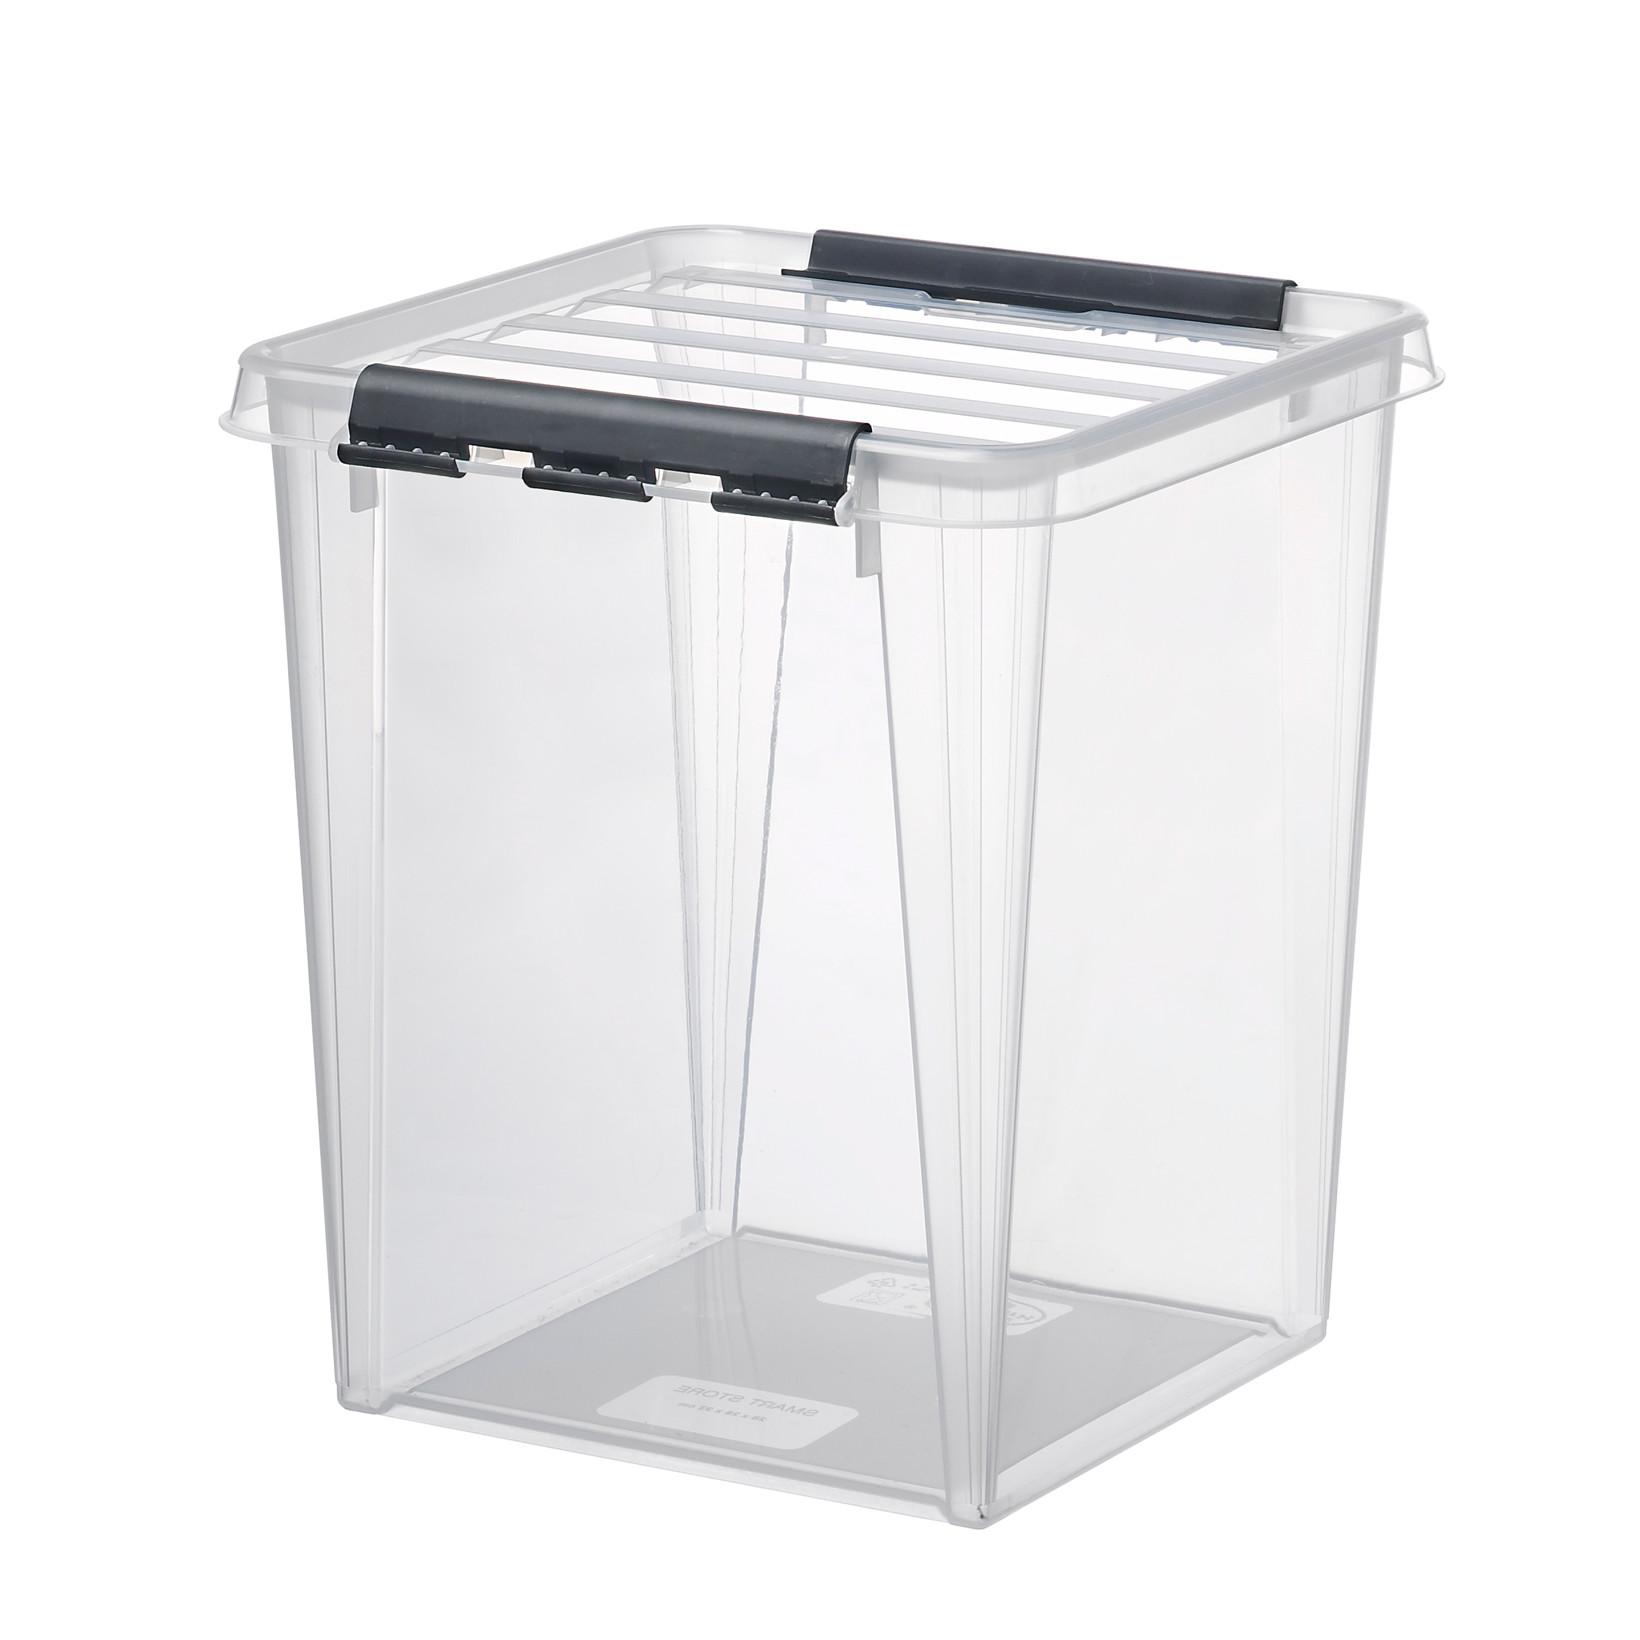 Plastikkasse - Smart Store 72 x 40 x 39 cm i klar med låg